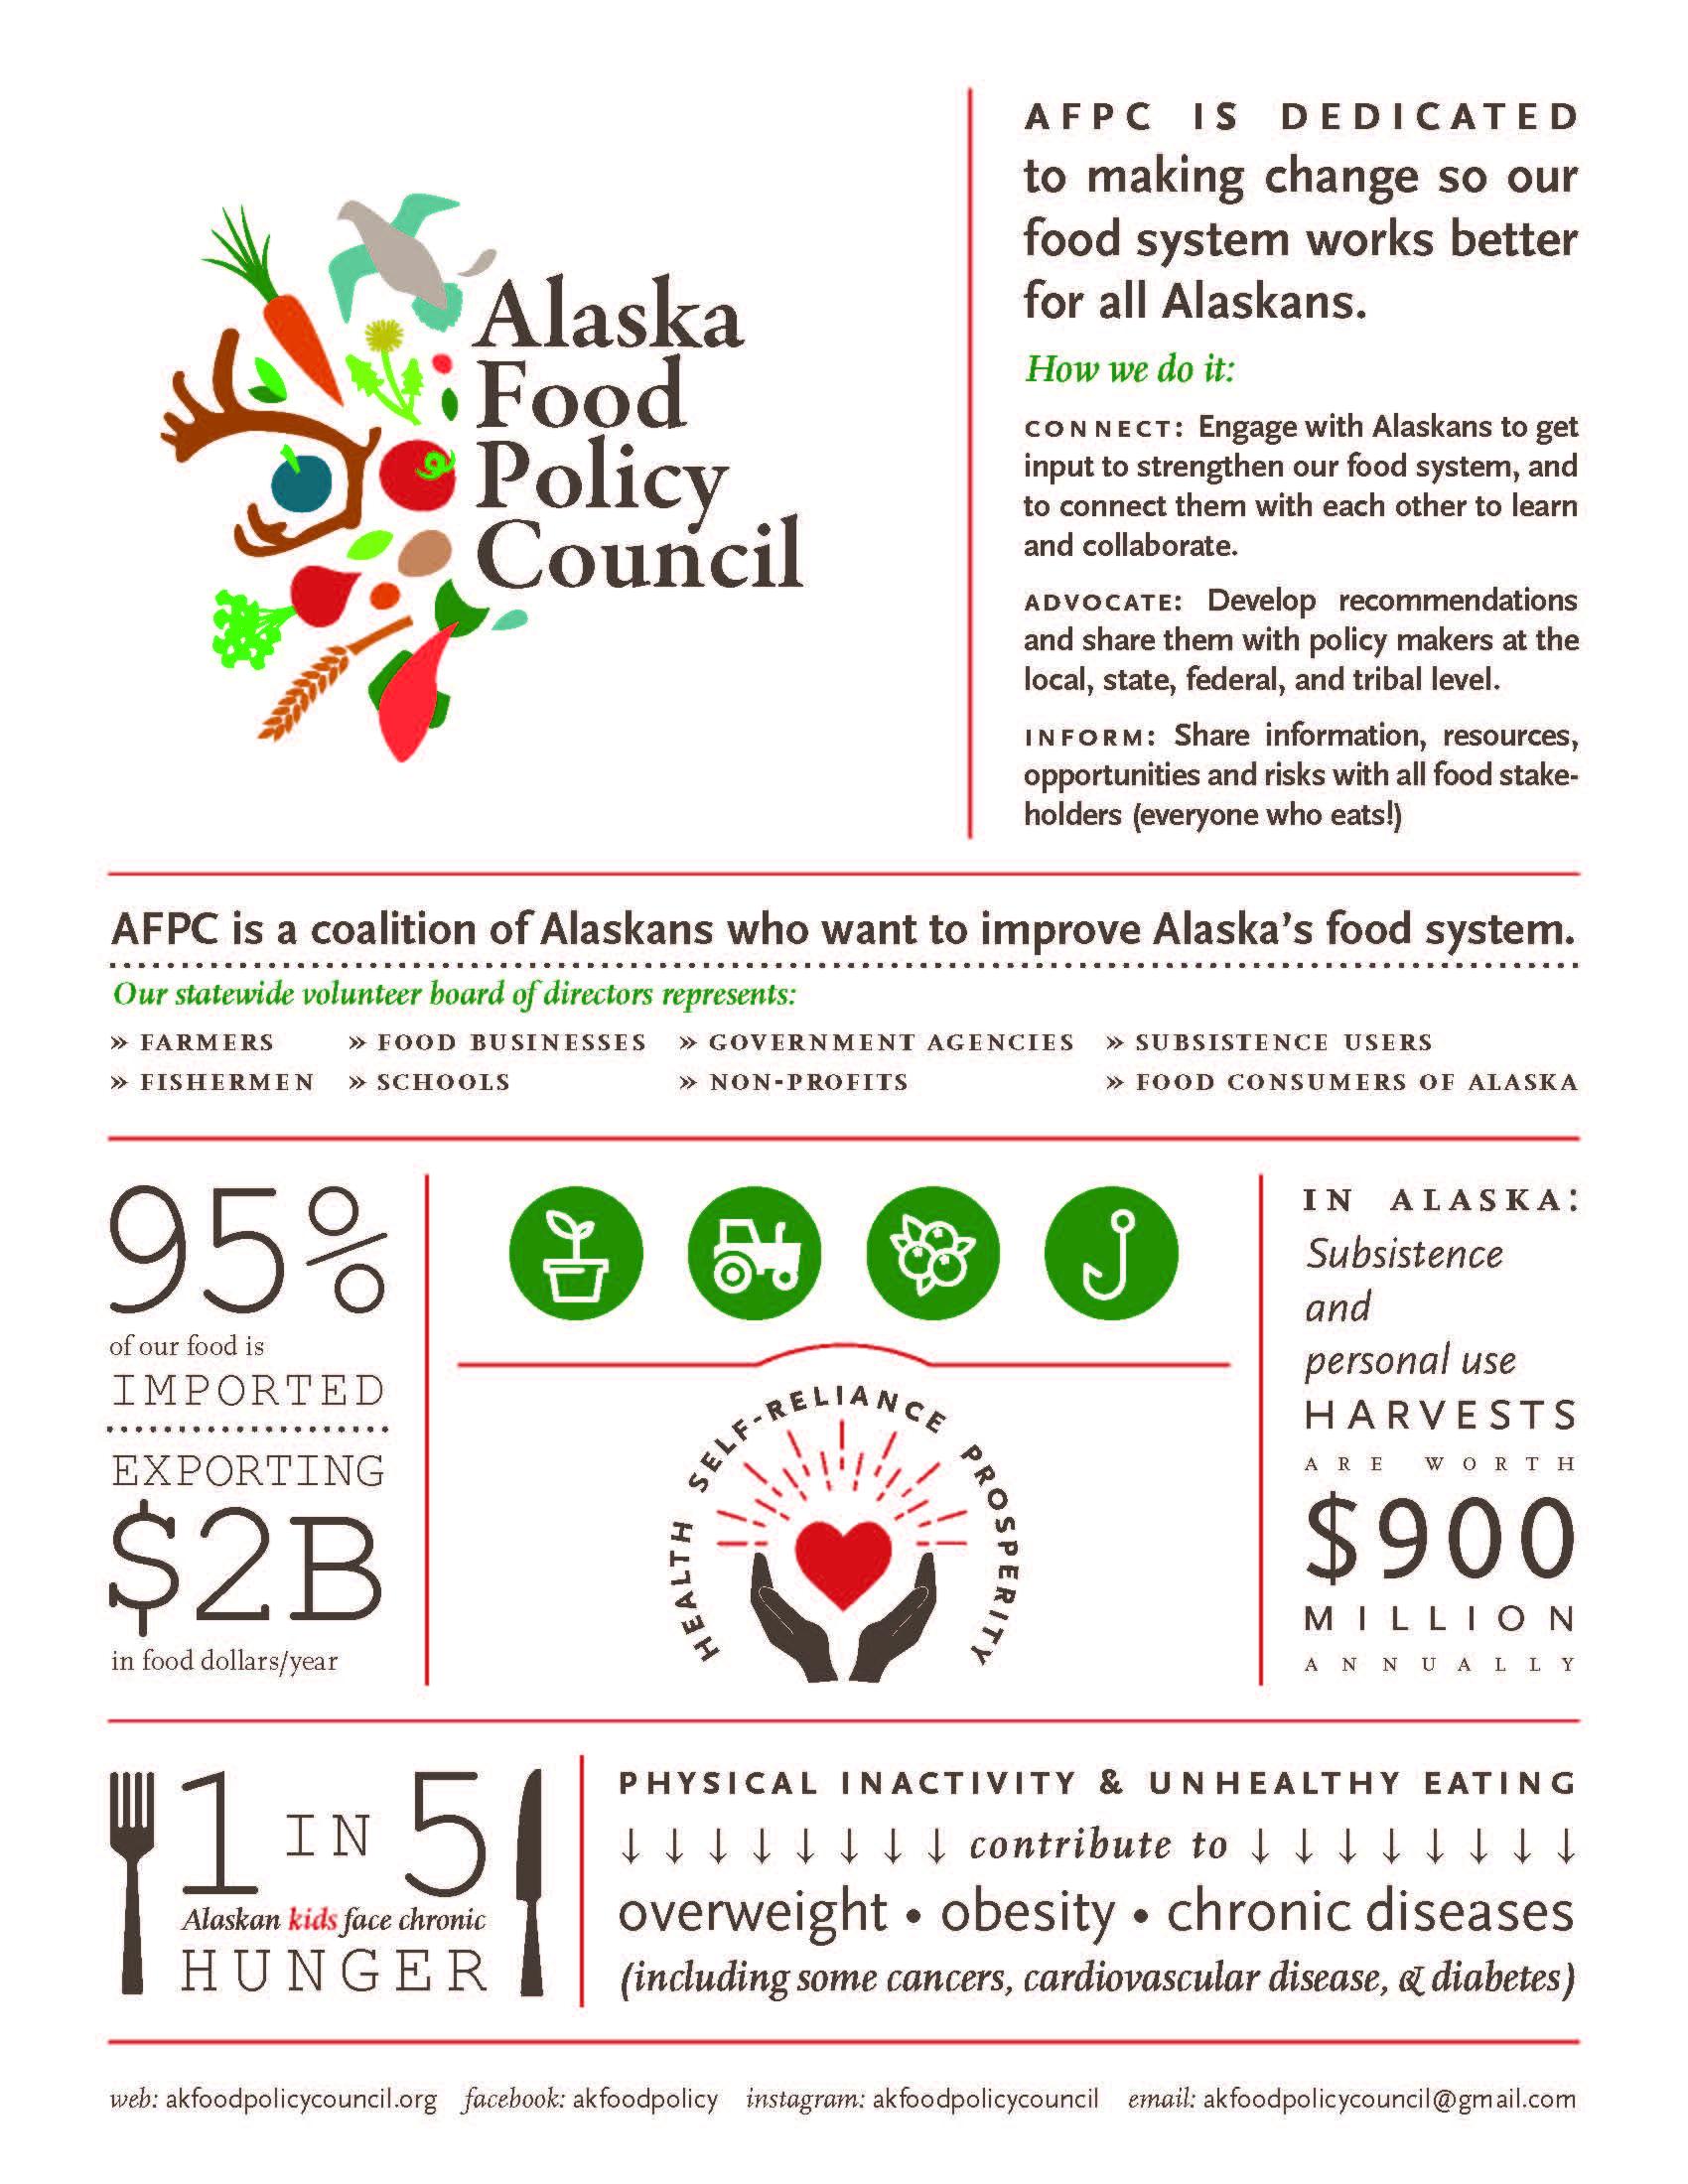 AFPC-infographic_R4.jpg